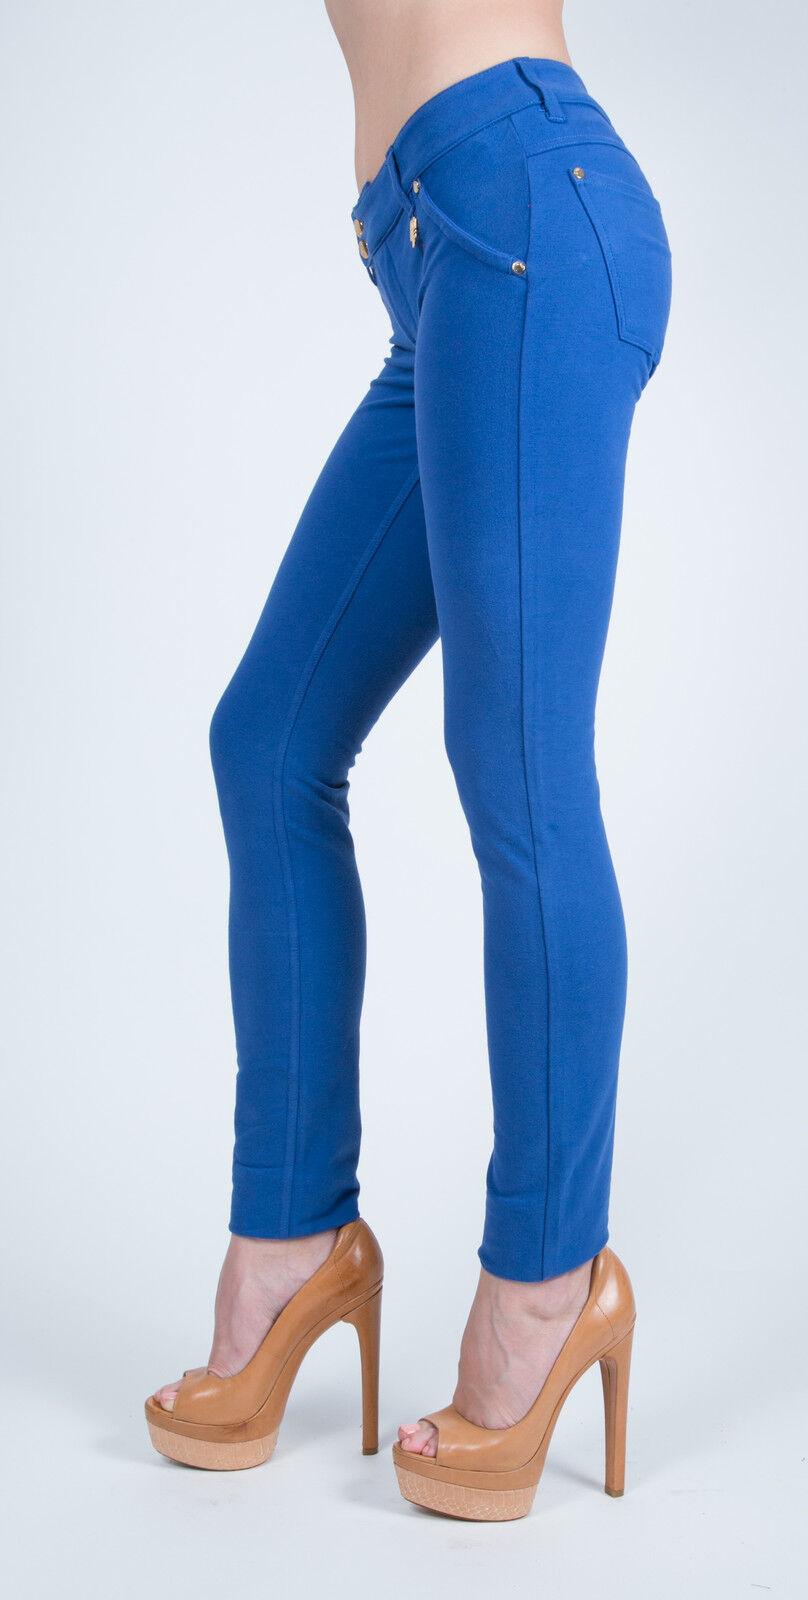 MET in Jeans K-FIT J bluee Stretch Pants Slim fit plush trousers low-waist